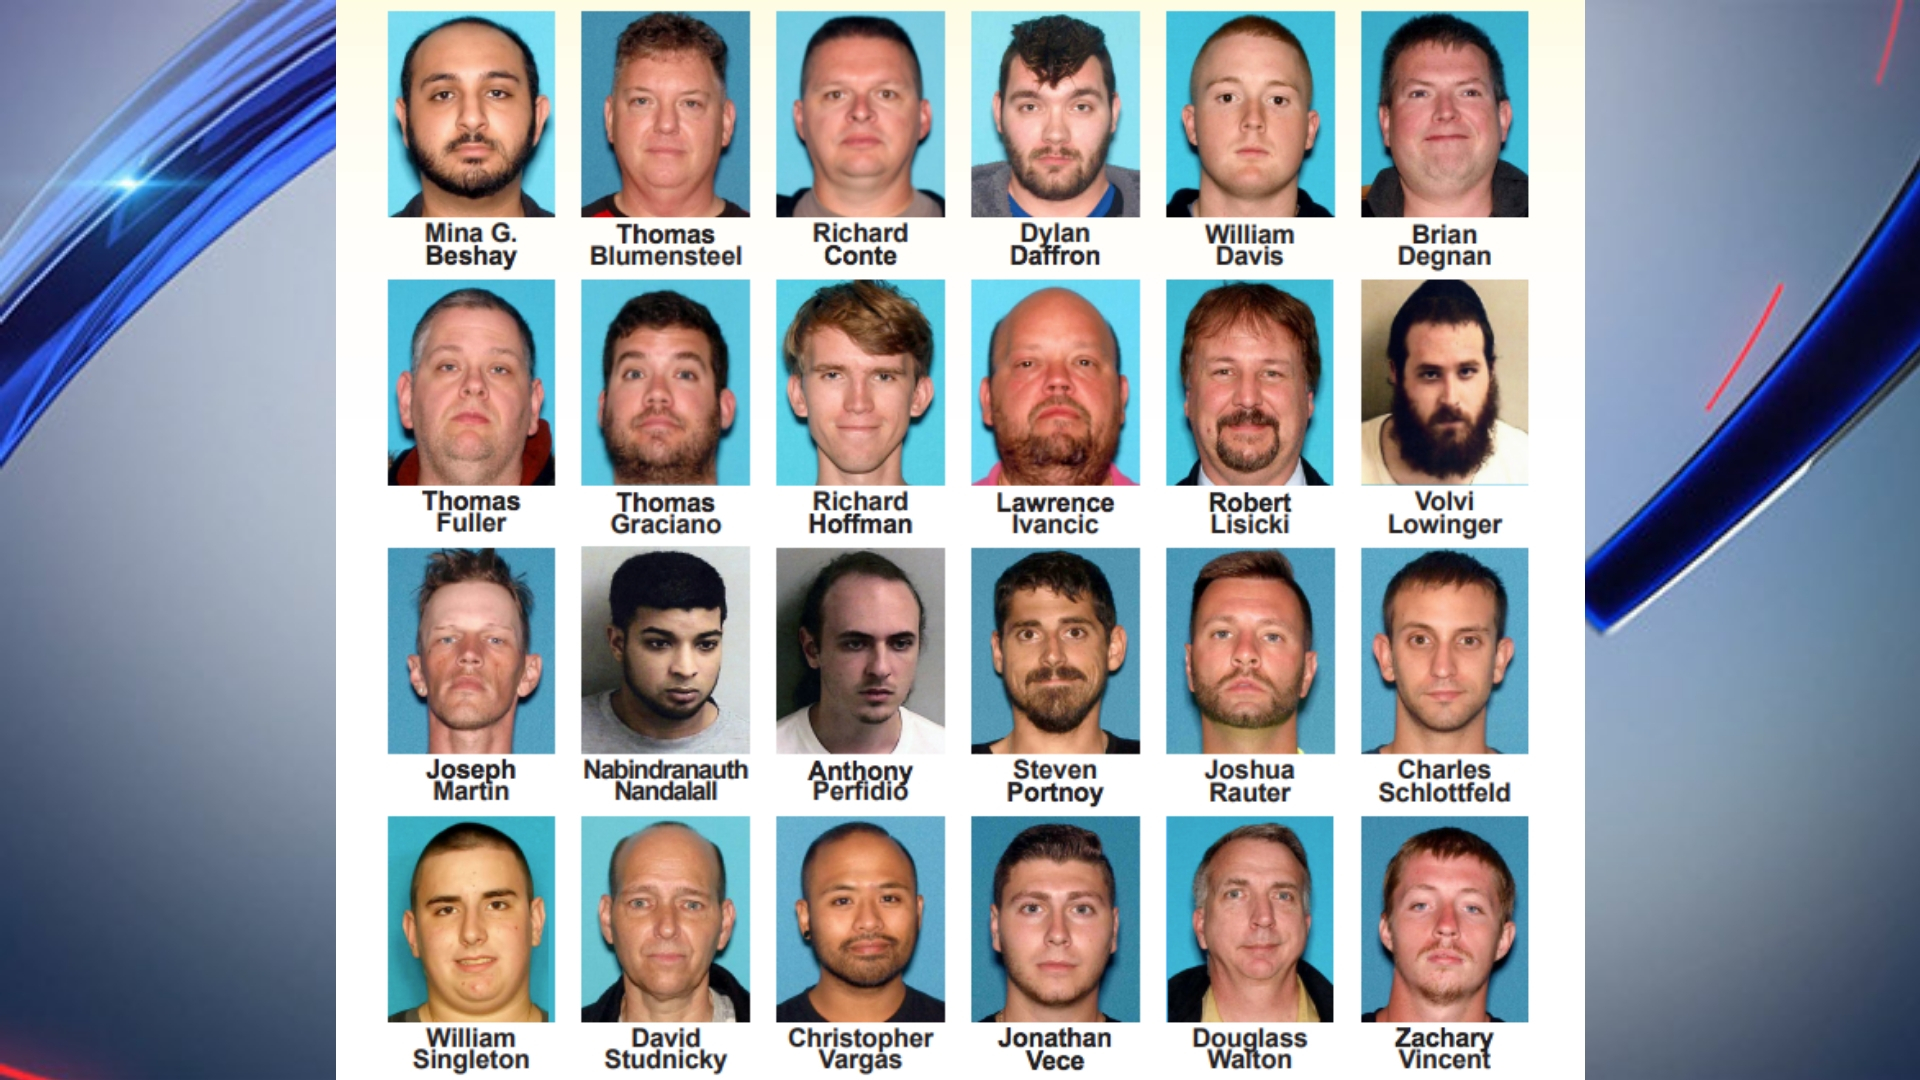 24 Men Including Cop Arrested For Allegedly Using Apps Games To Lure Children Nj Officials Pix11